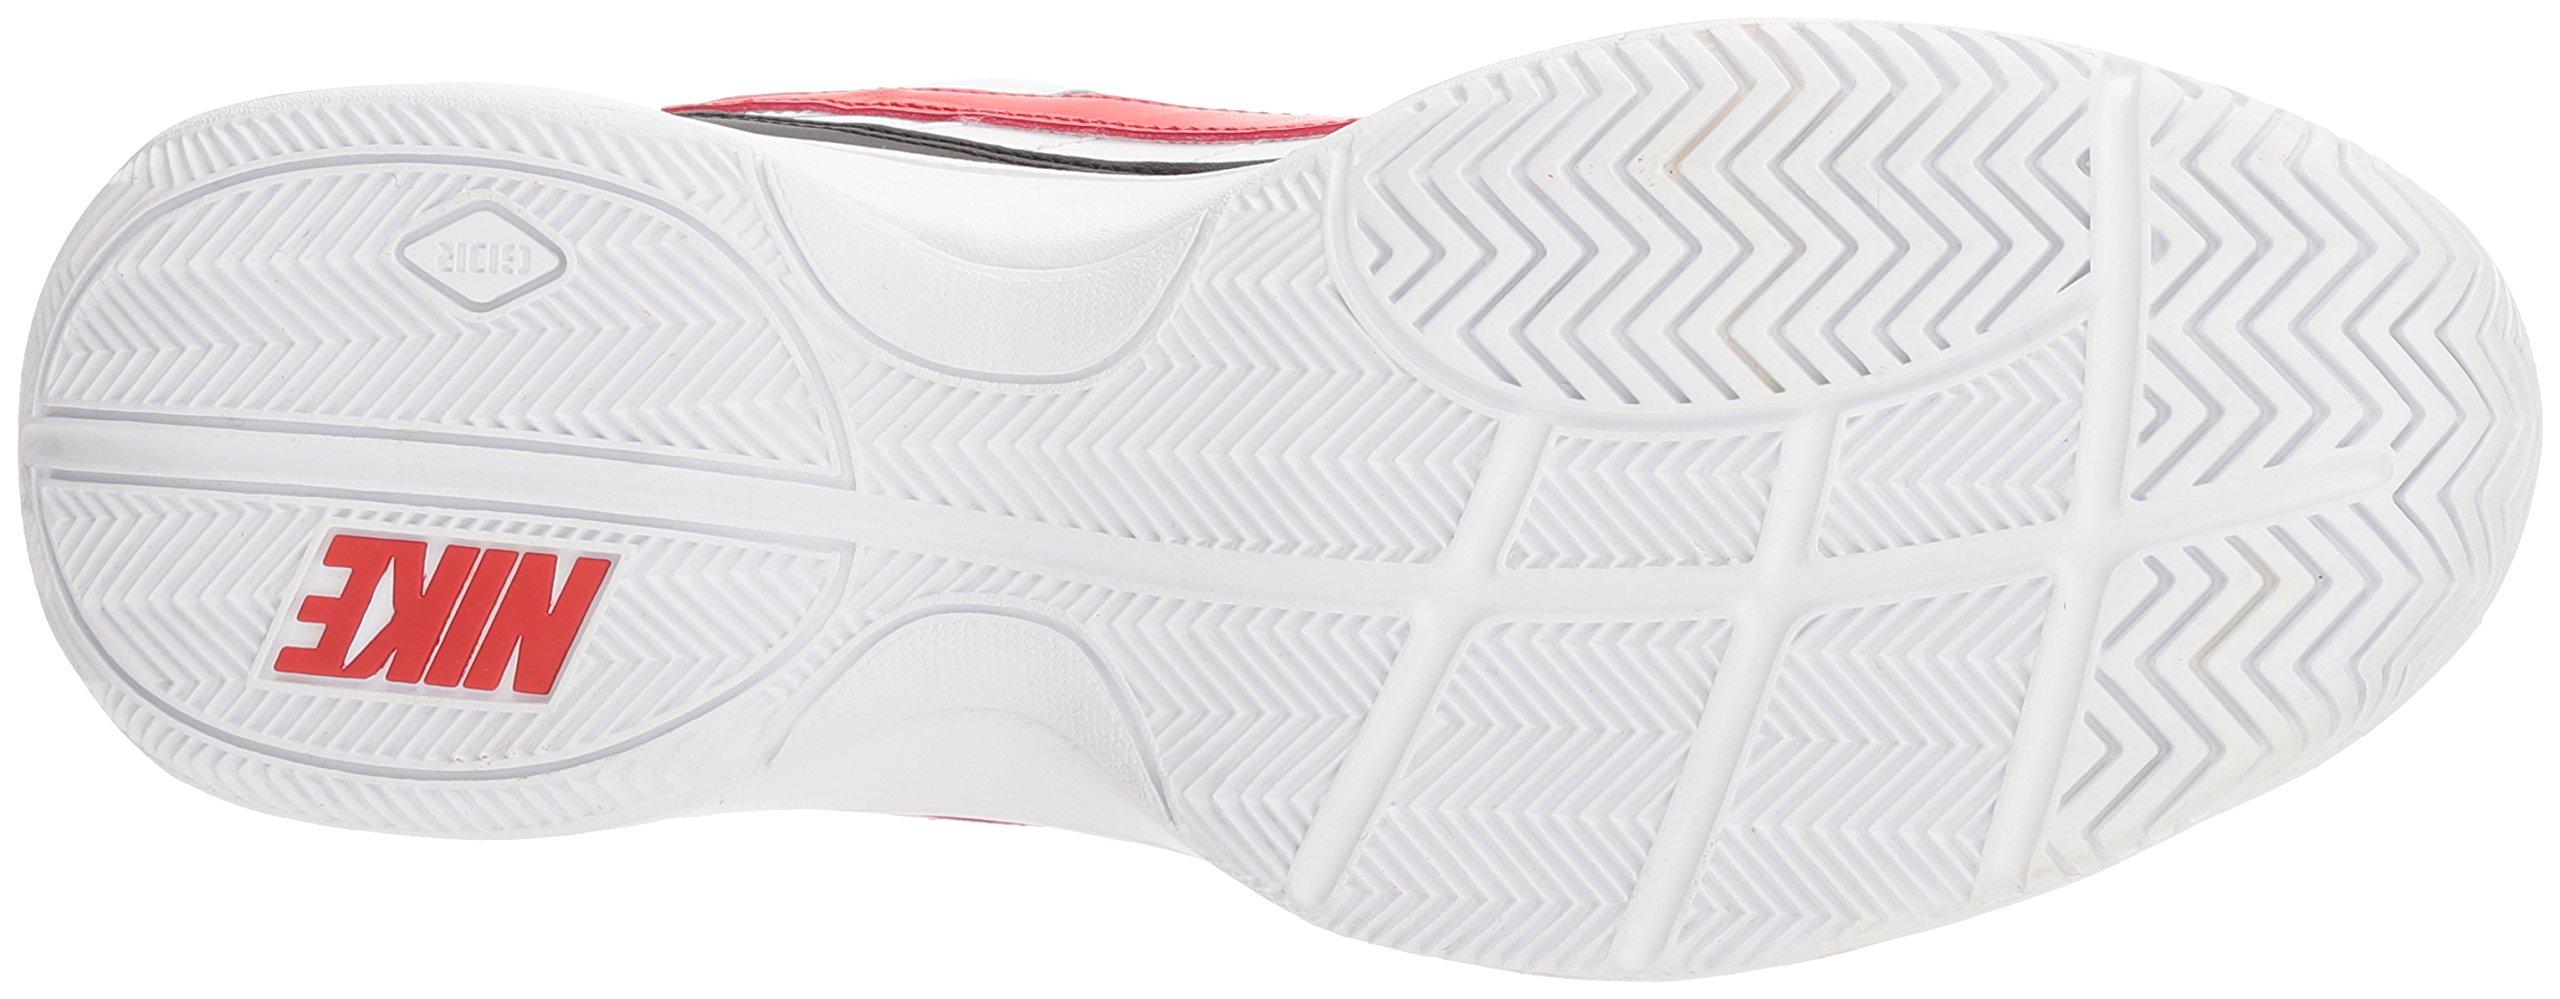 Nike Men's Court Lite Tennis Shoe, White/University red/Black, 7.5 D US by Nike (Image #3)